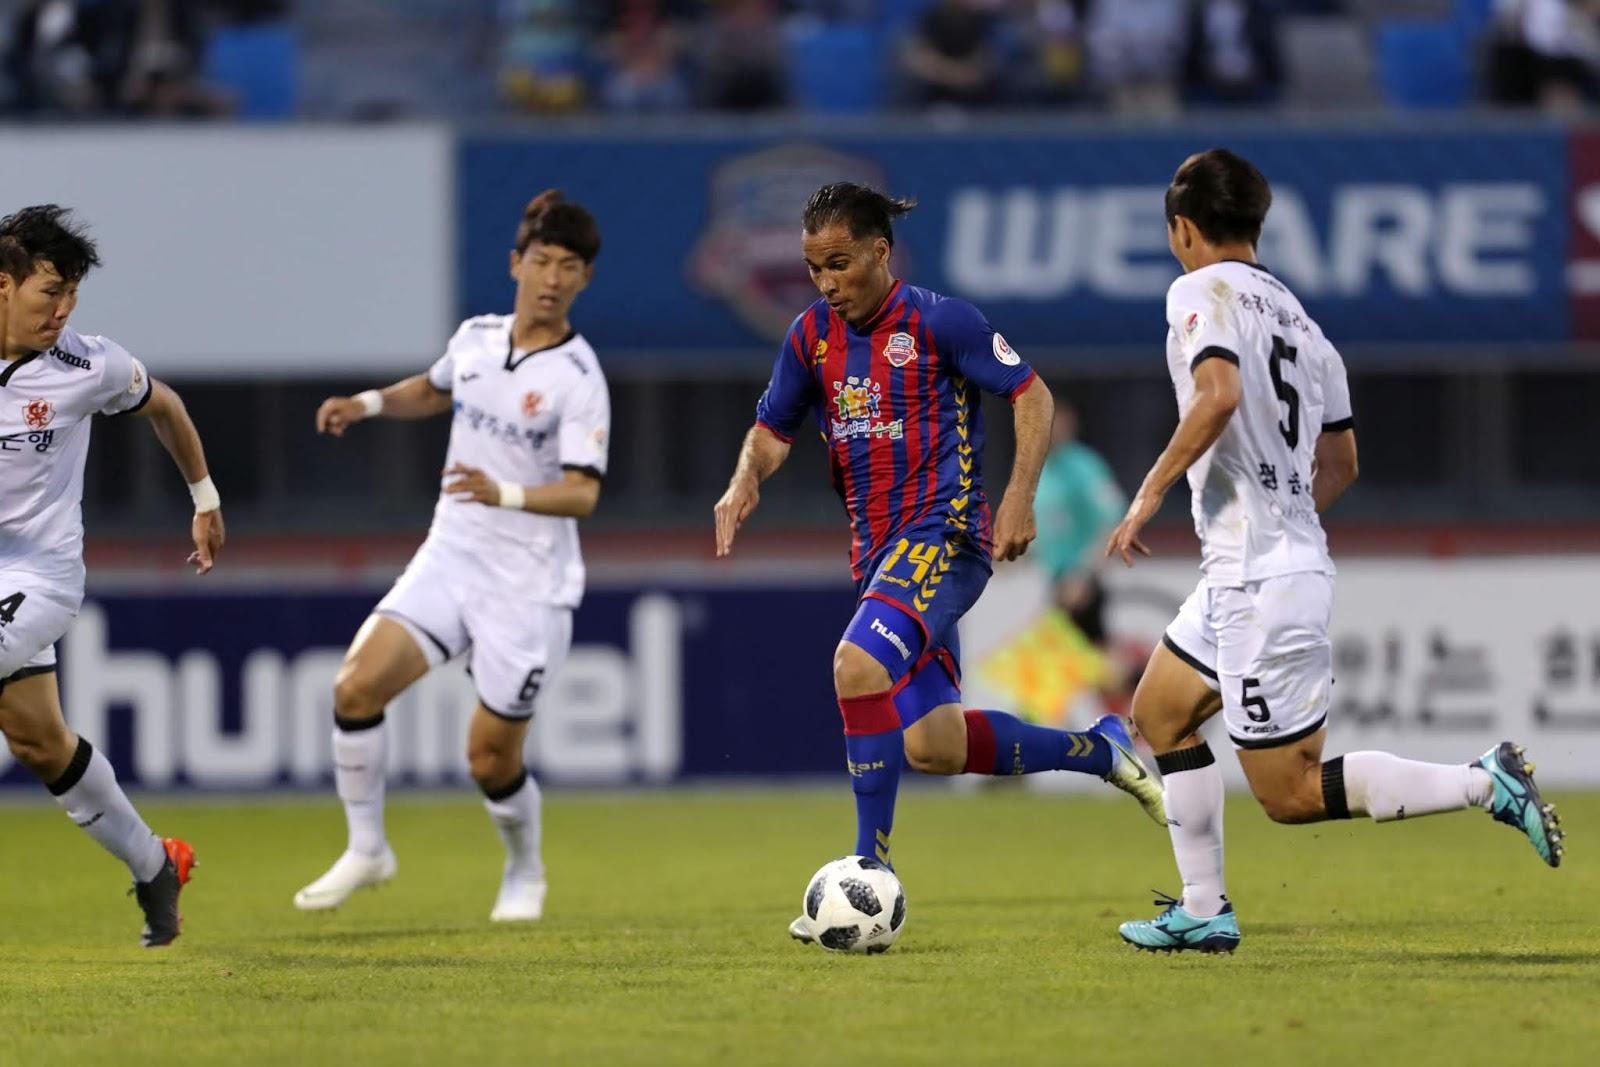 Preview: Suwon FC vs Asan Mugunghwa